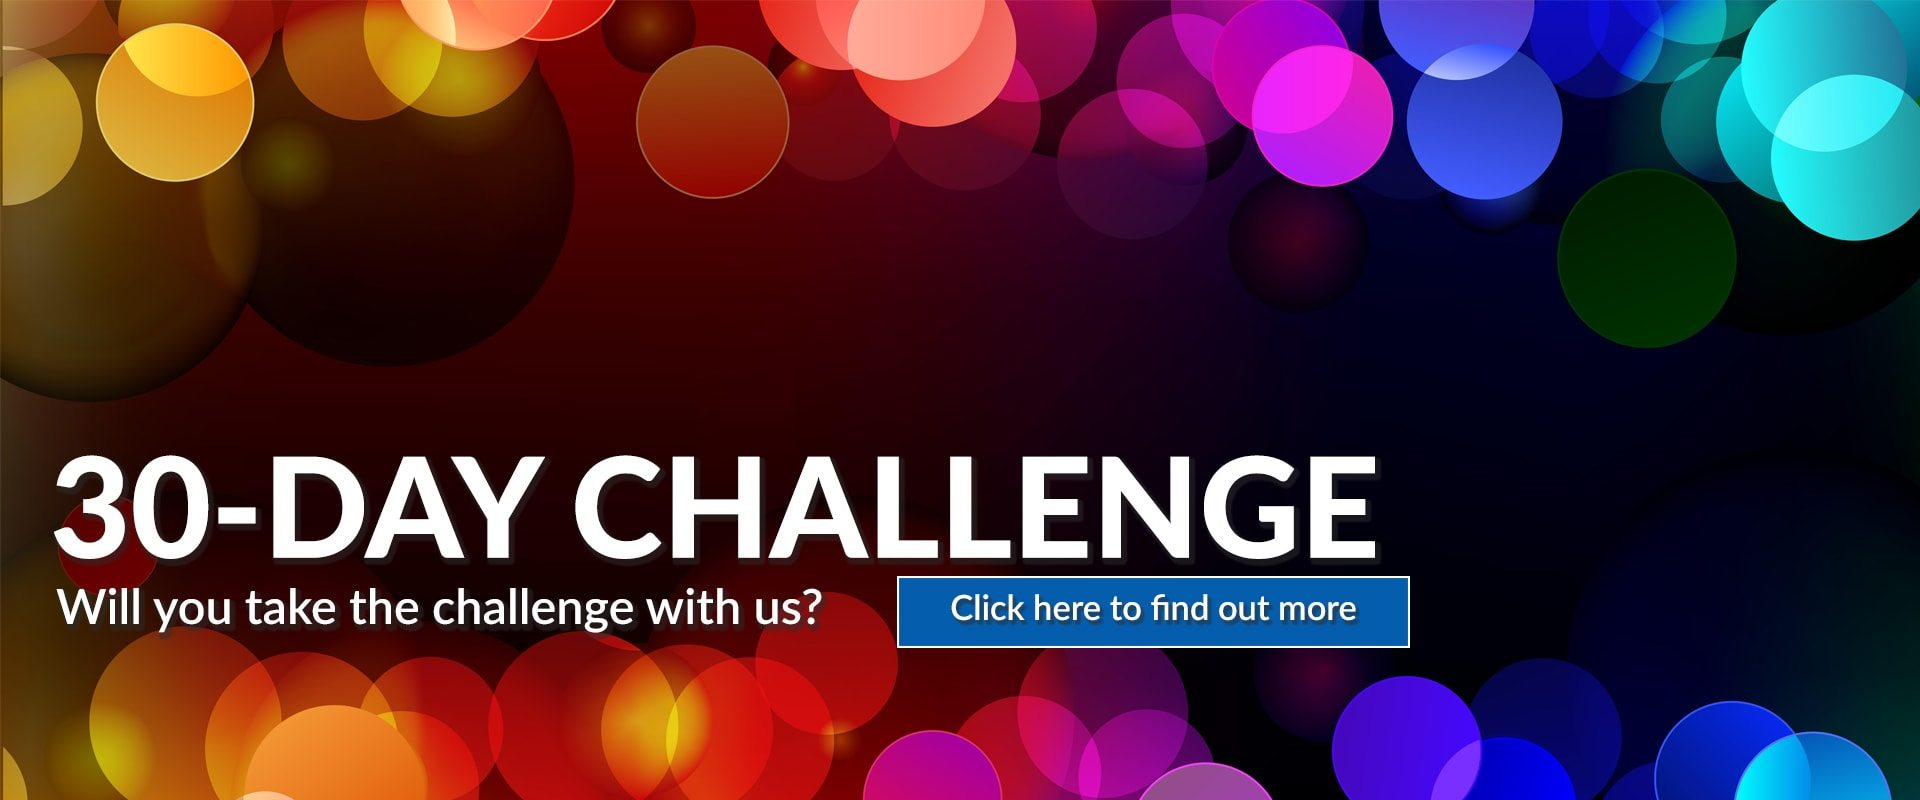 91.3 KGLY Christian Radio East Texas 30-Day Challenge